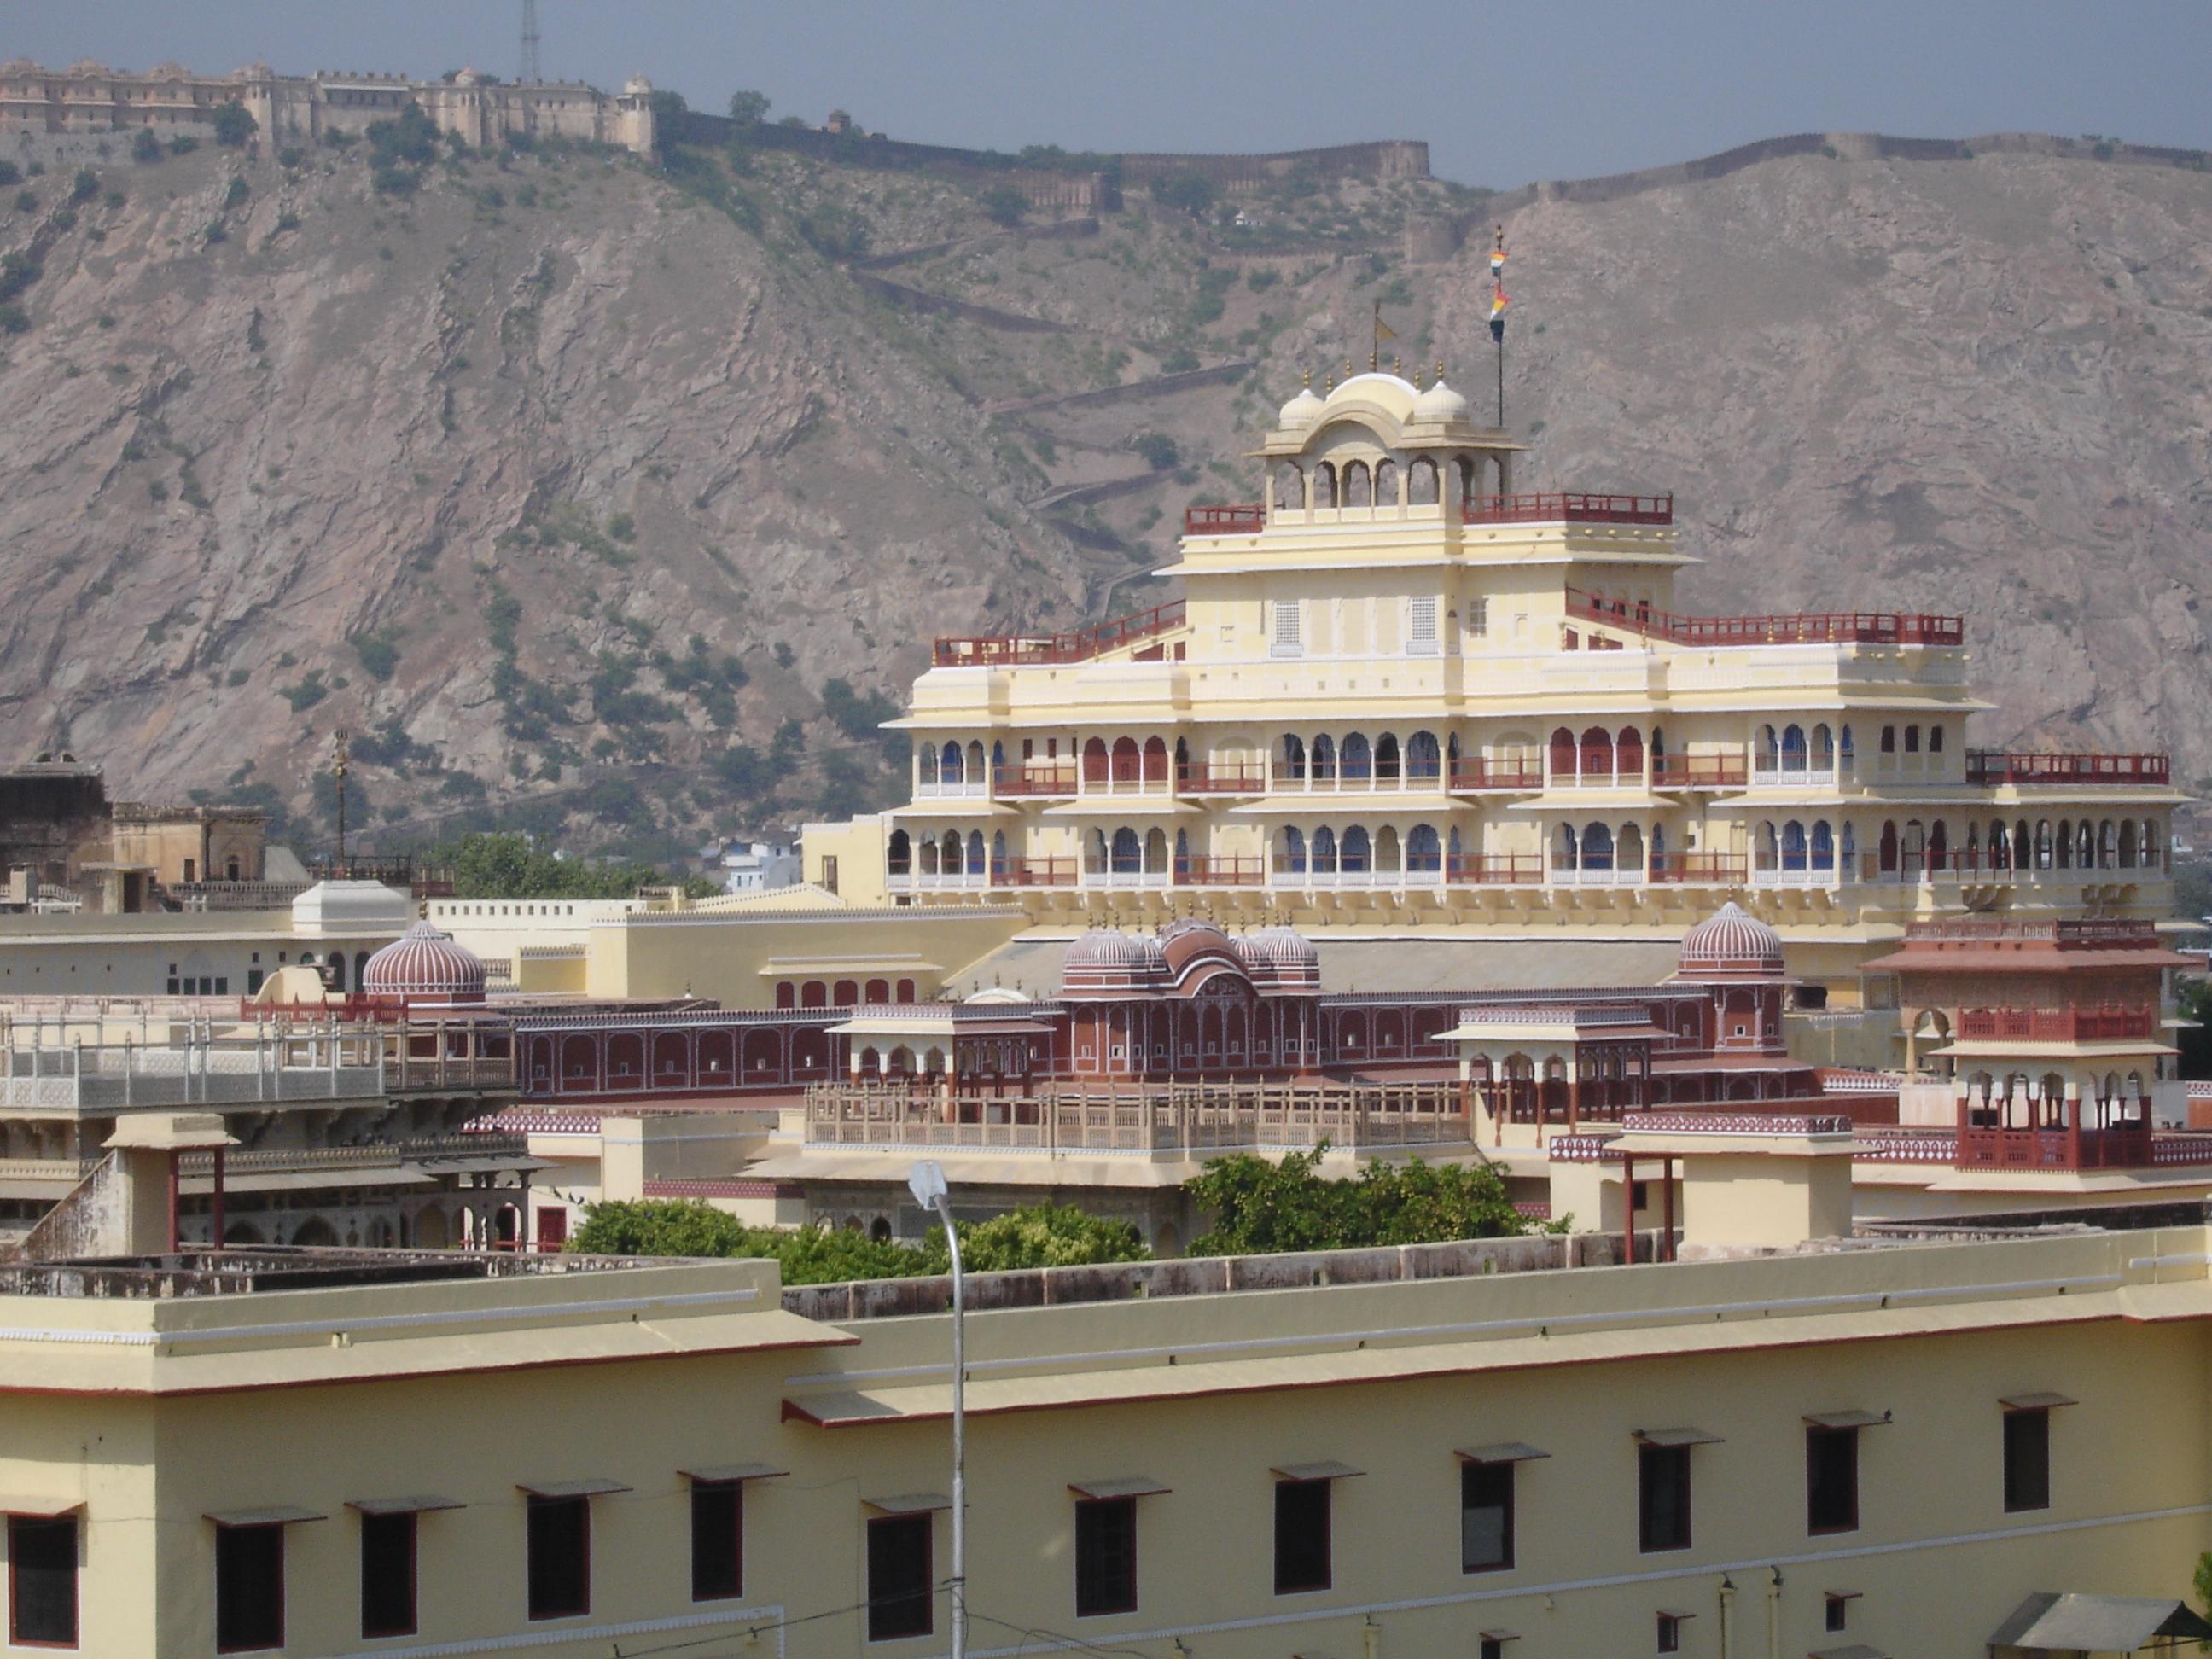 File:Jaipur.in City Palace, background Nahargarh Fort - panoramio.jpg